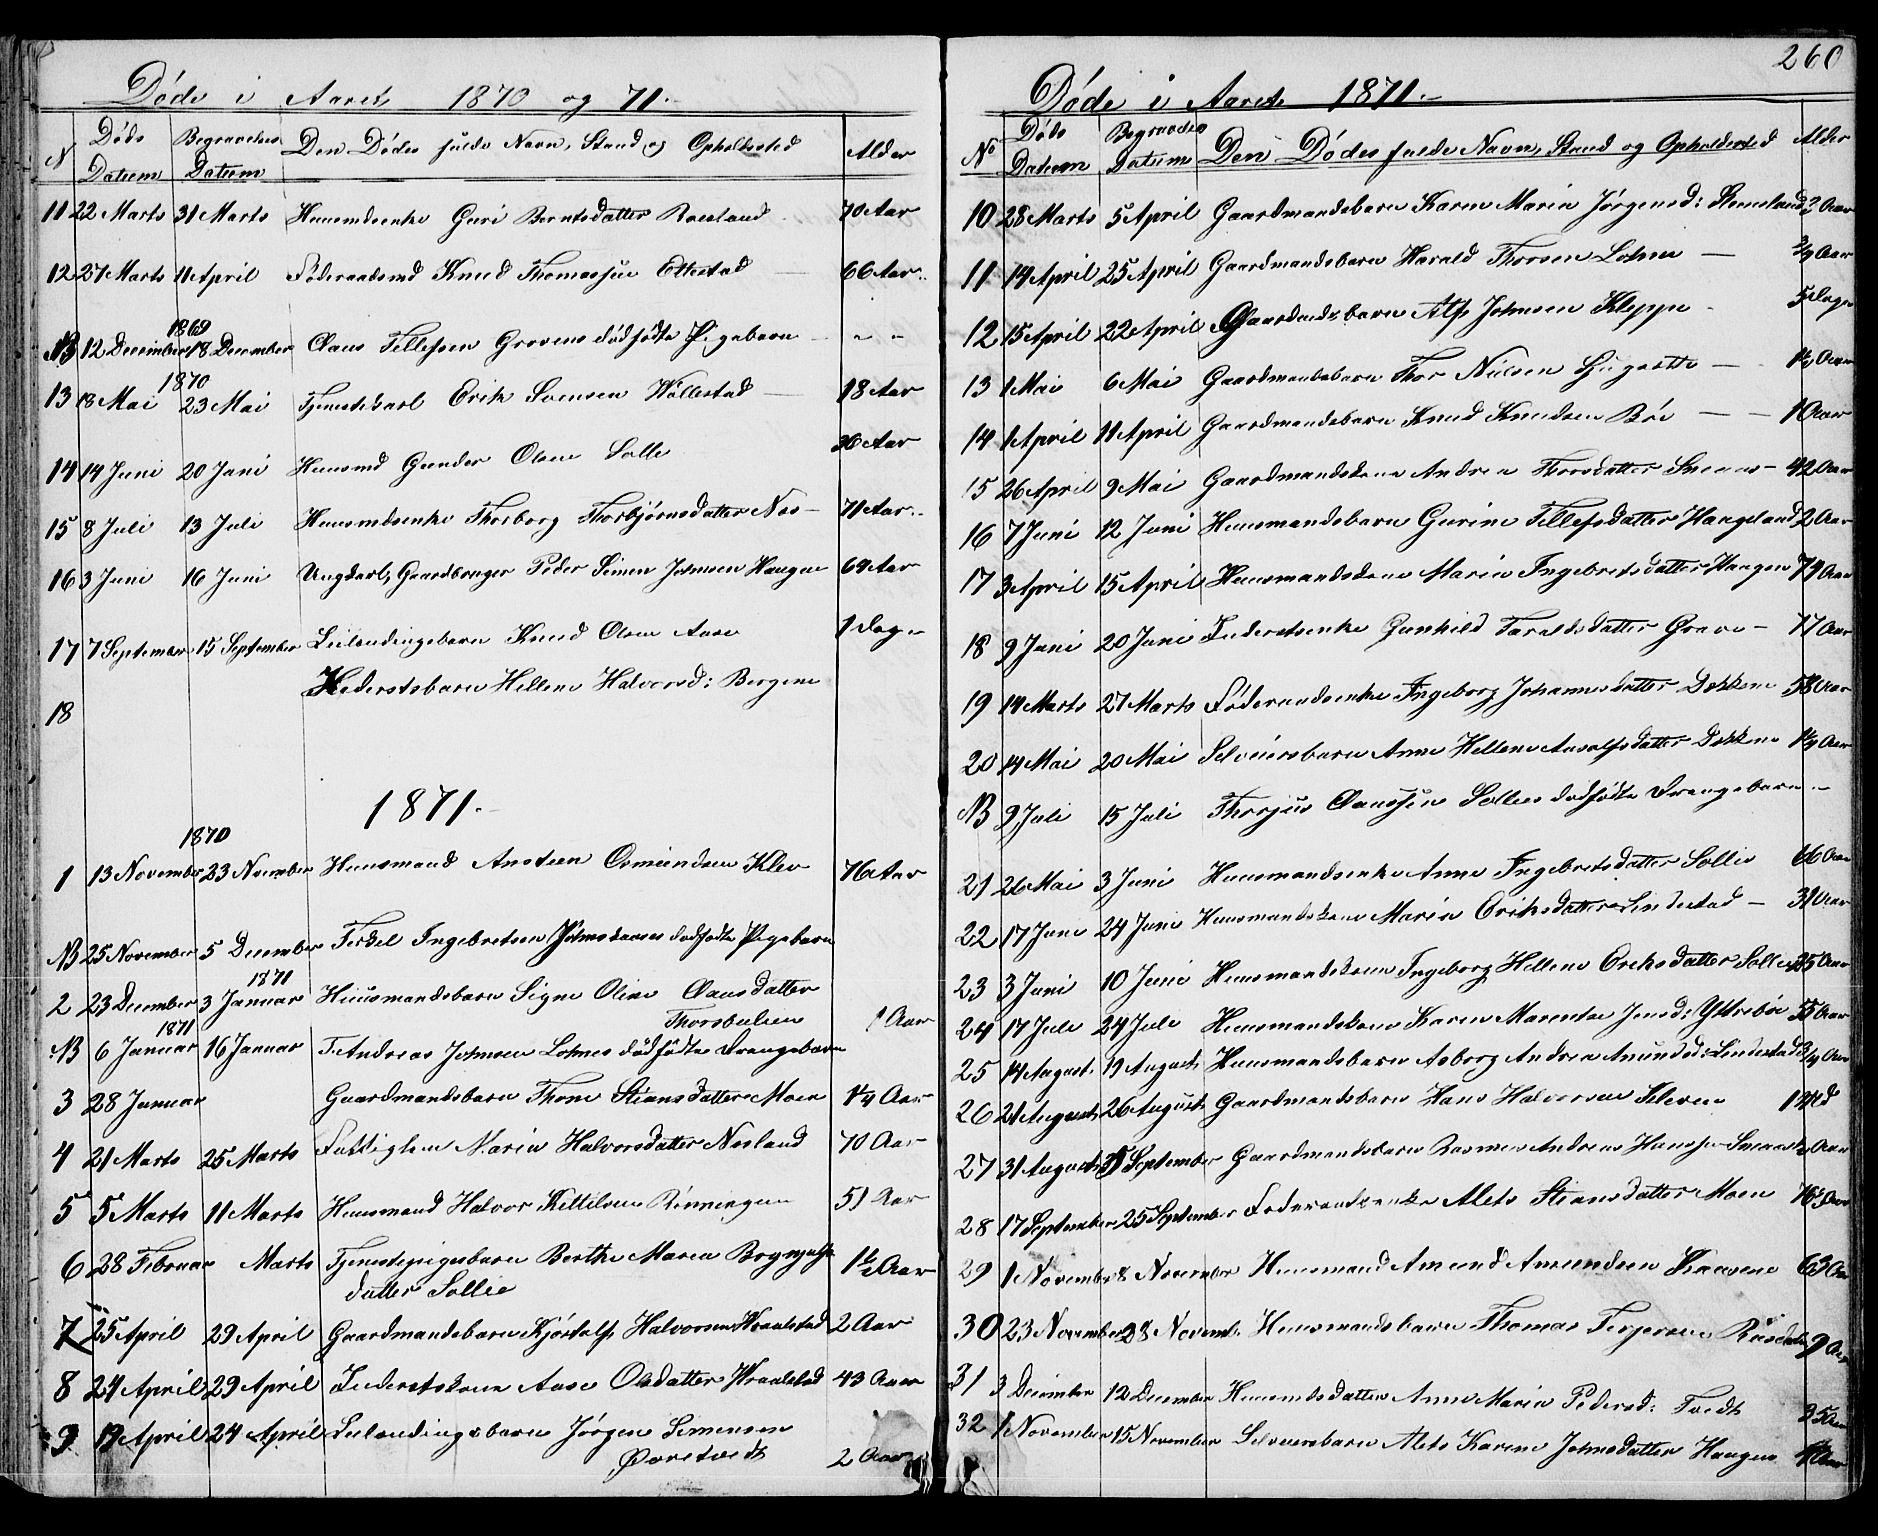 SAKO, Drangedal kirkebøker, G/Gb/L0001: Klokkerbok nr. II 1, 1856-1894, s. 260